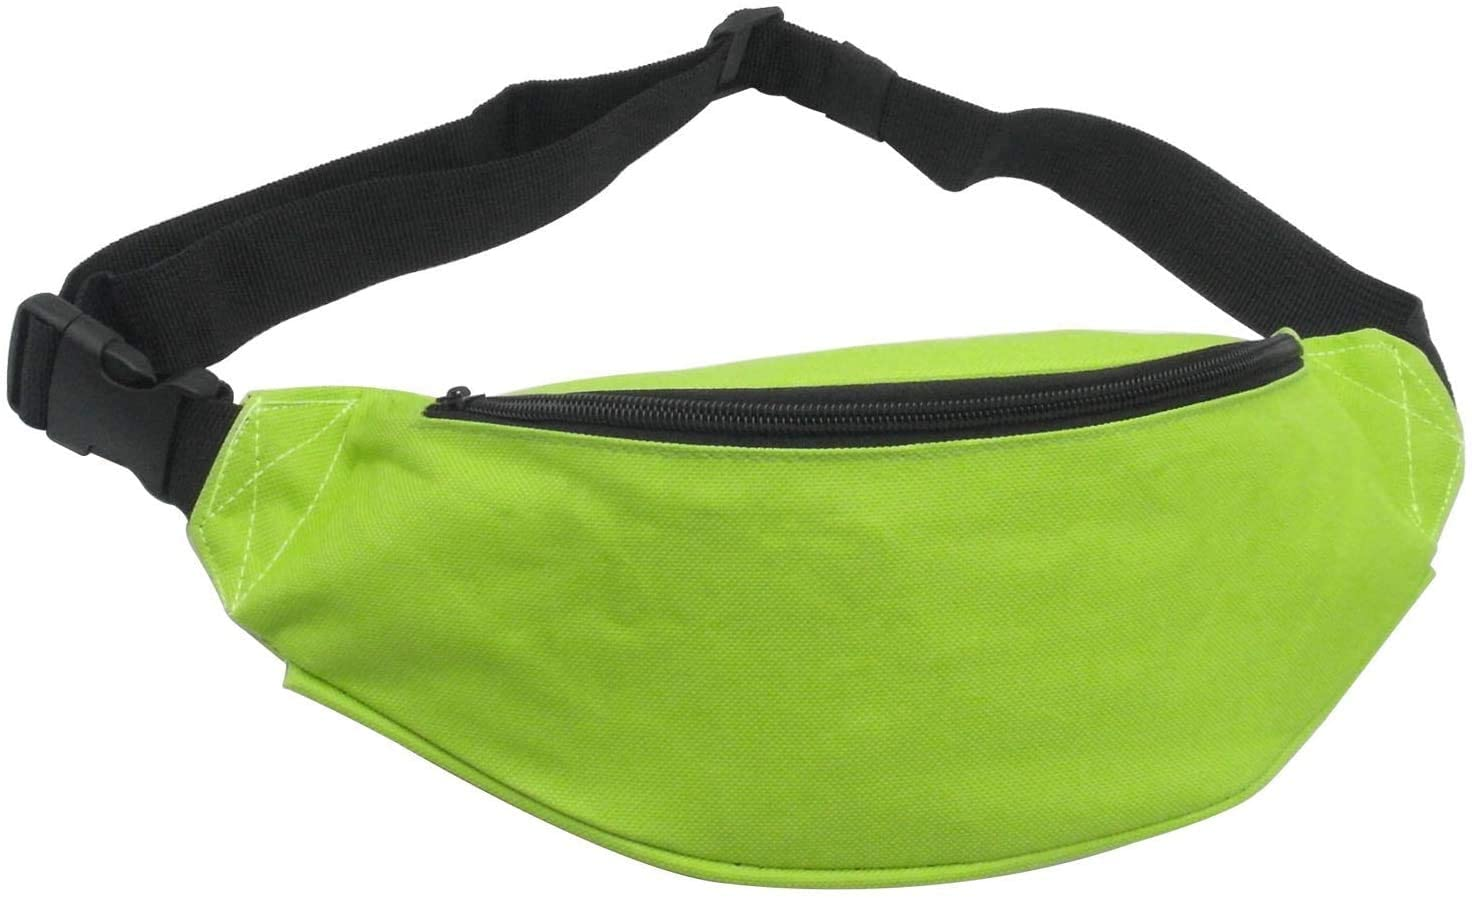 Unisex Men Women Fashion Sporty Multi-Purpose 2-Zipper Waist Belt Bag Fanny Pack Adjustable Strap for Sport Hiking Traveling Passport Wallet Green